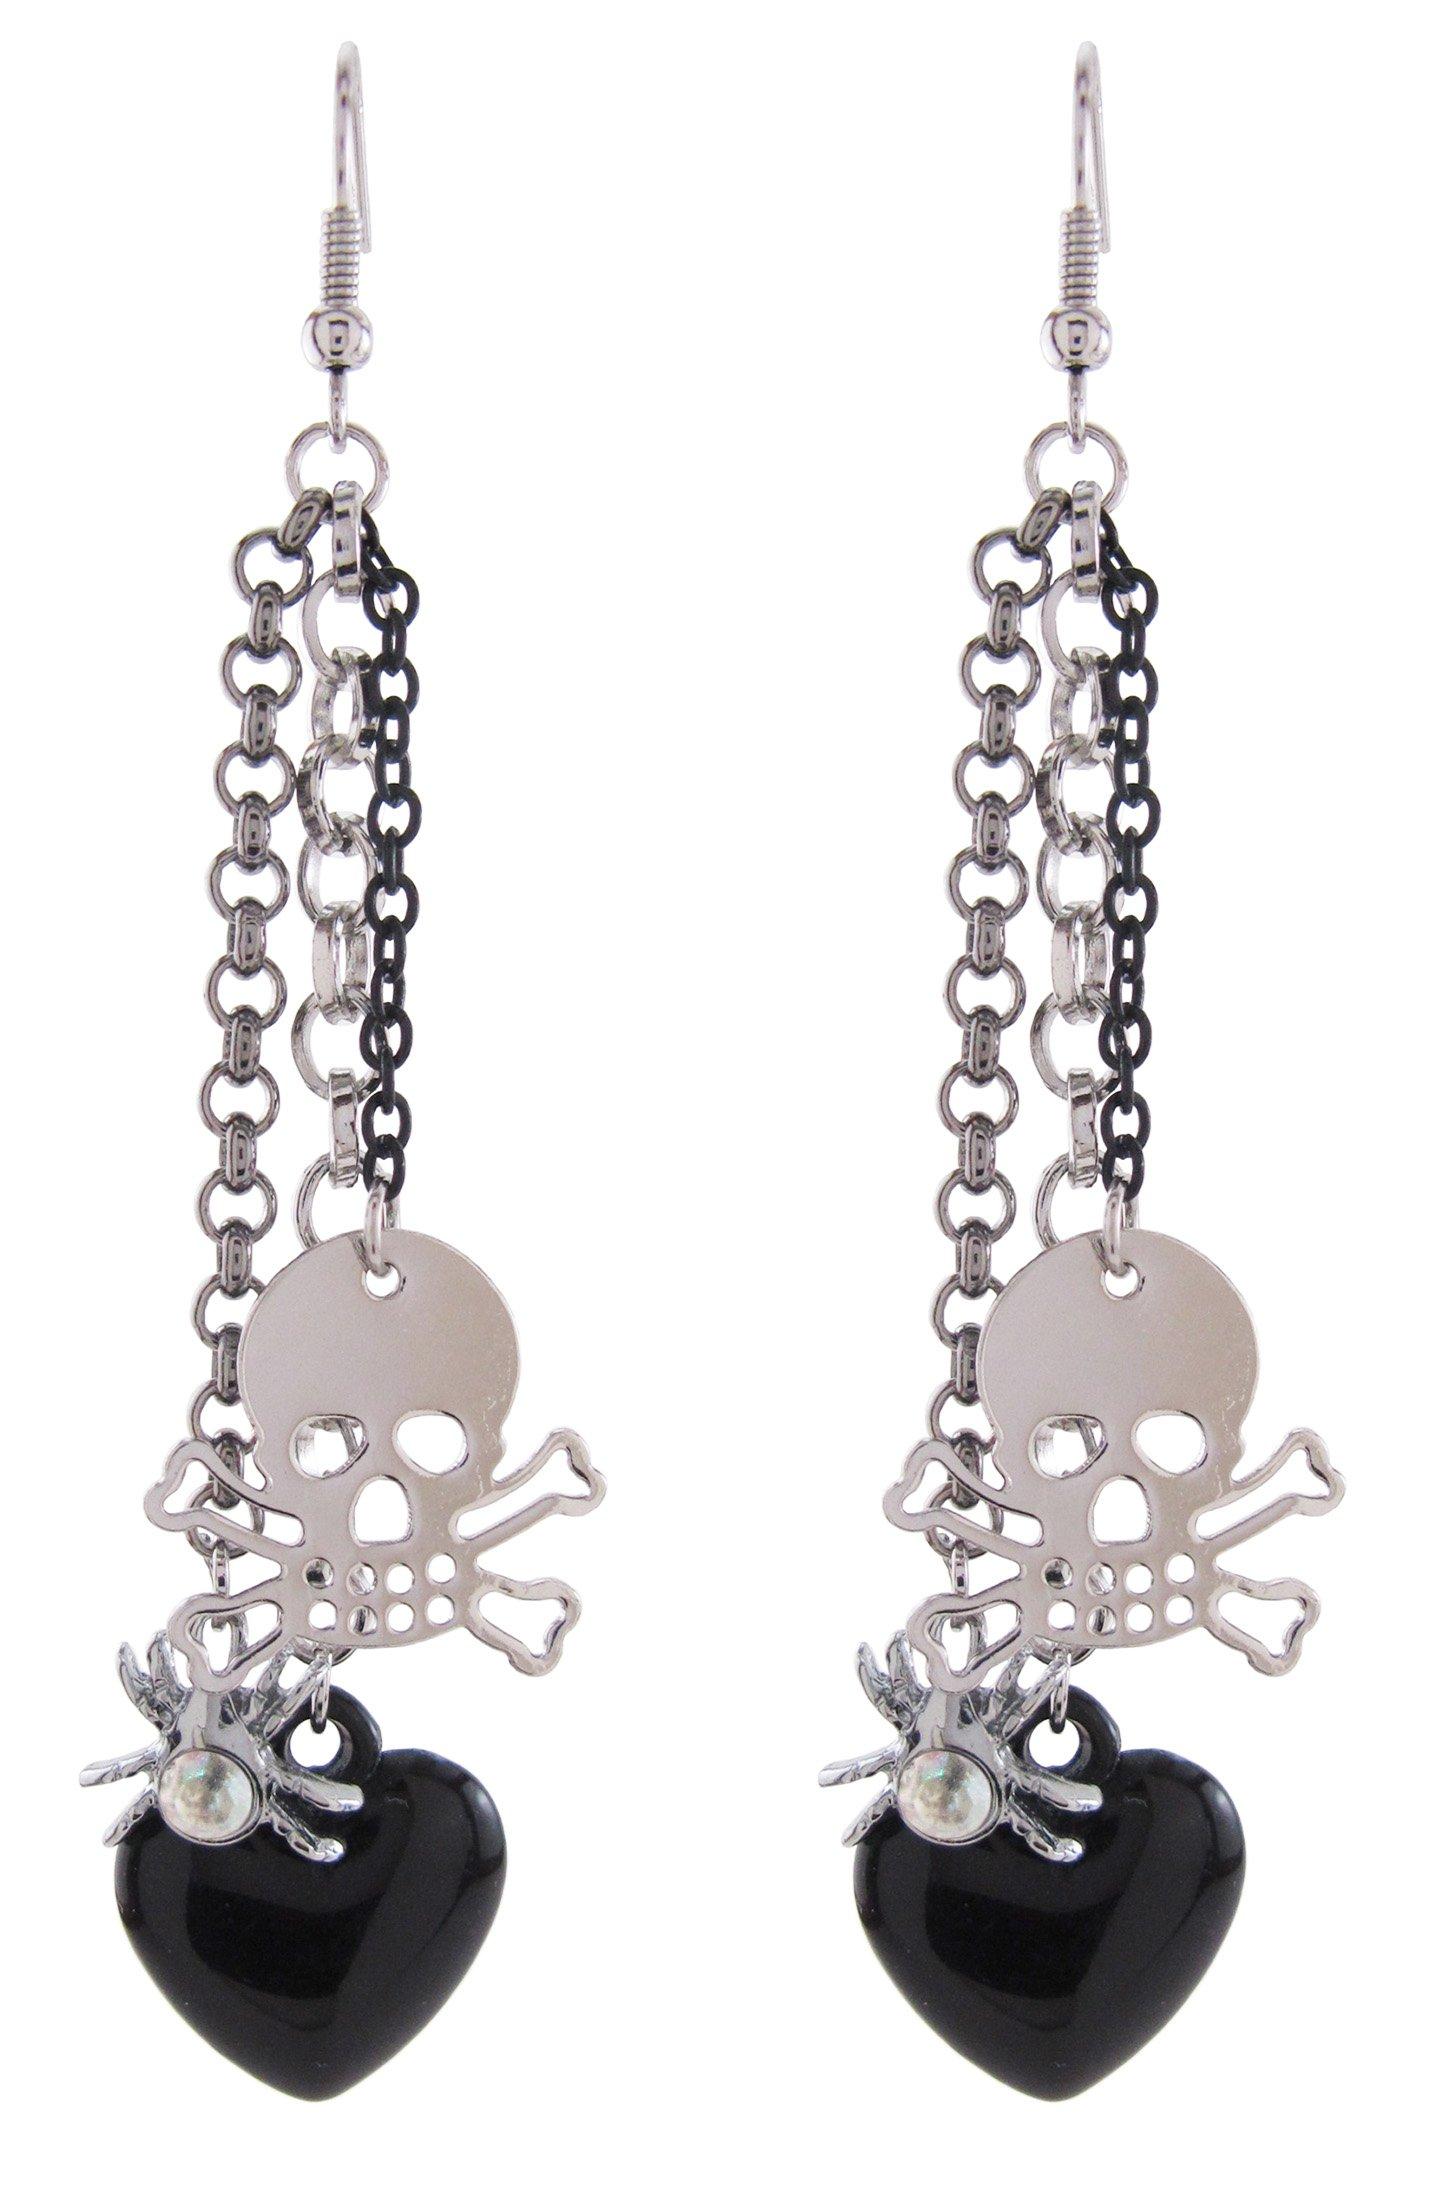 DaisyJewel Halloween Tarantula Love Skull Dangle Earrings by DaisyJewel (Image #1)